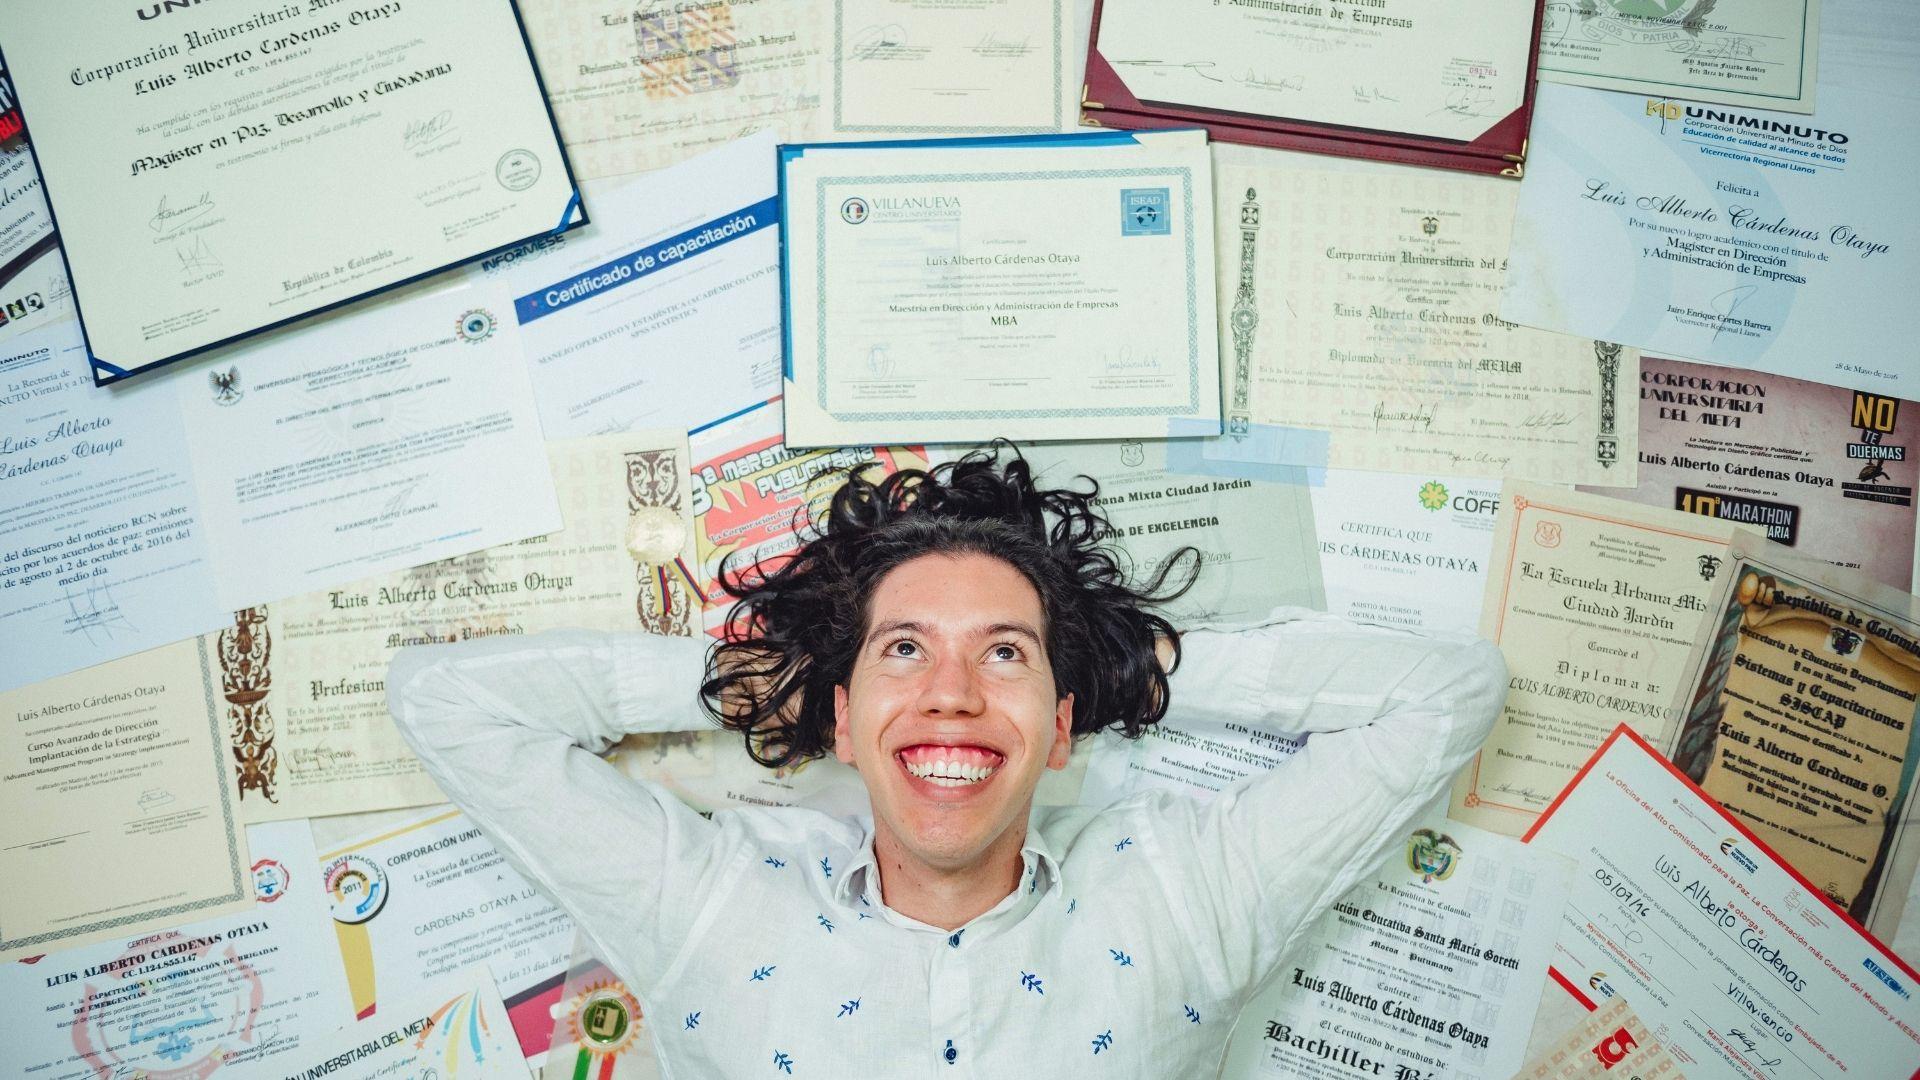 Salary Certificate Format Word| Download Salary Certificate Letter Word Format